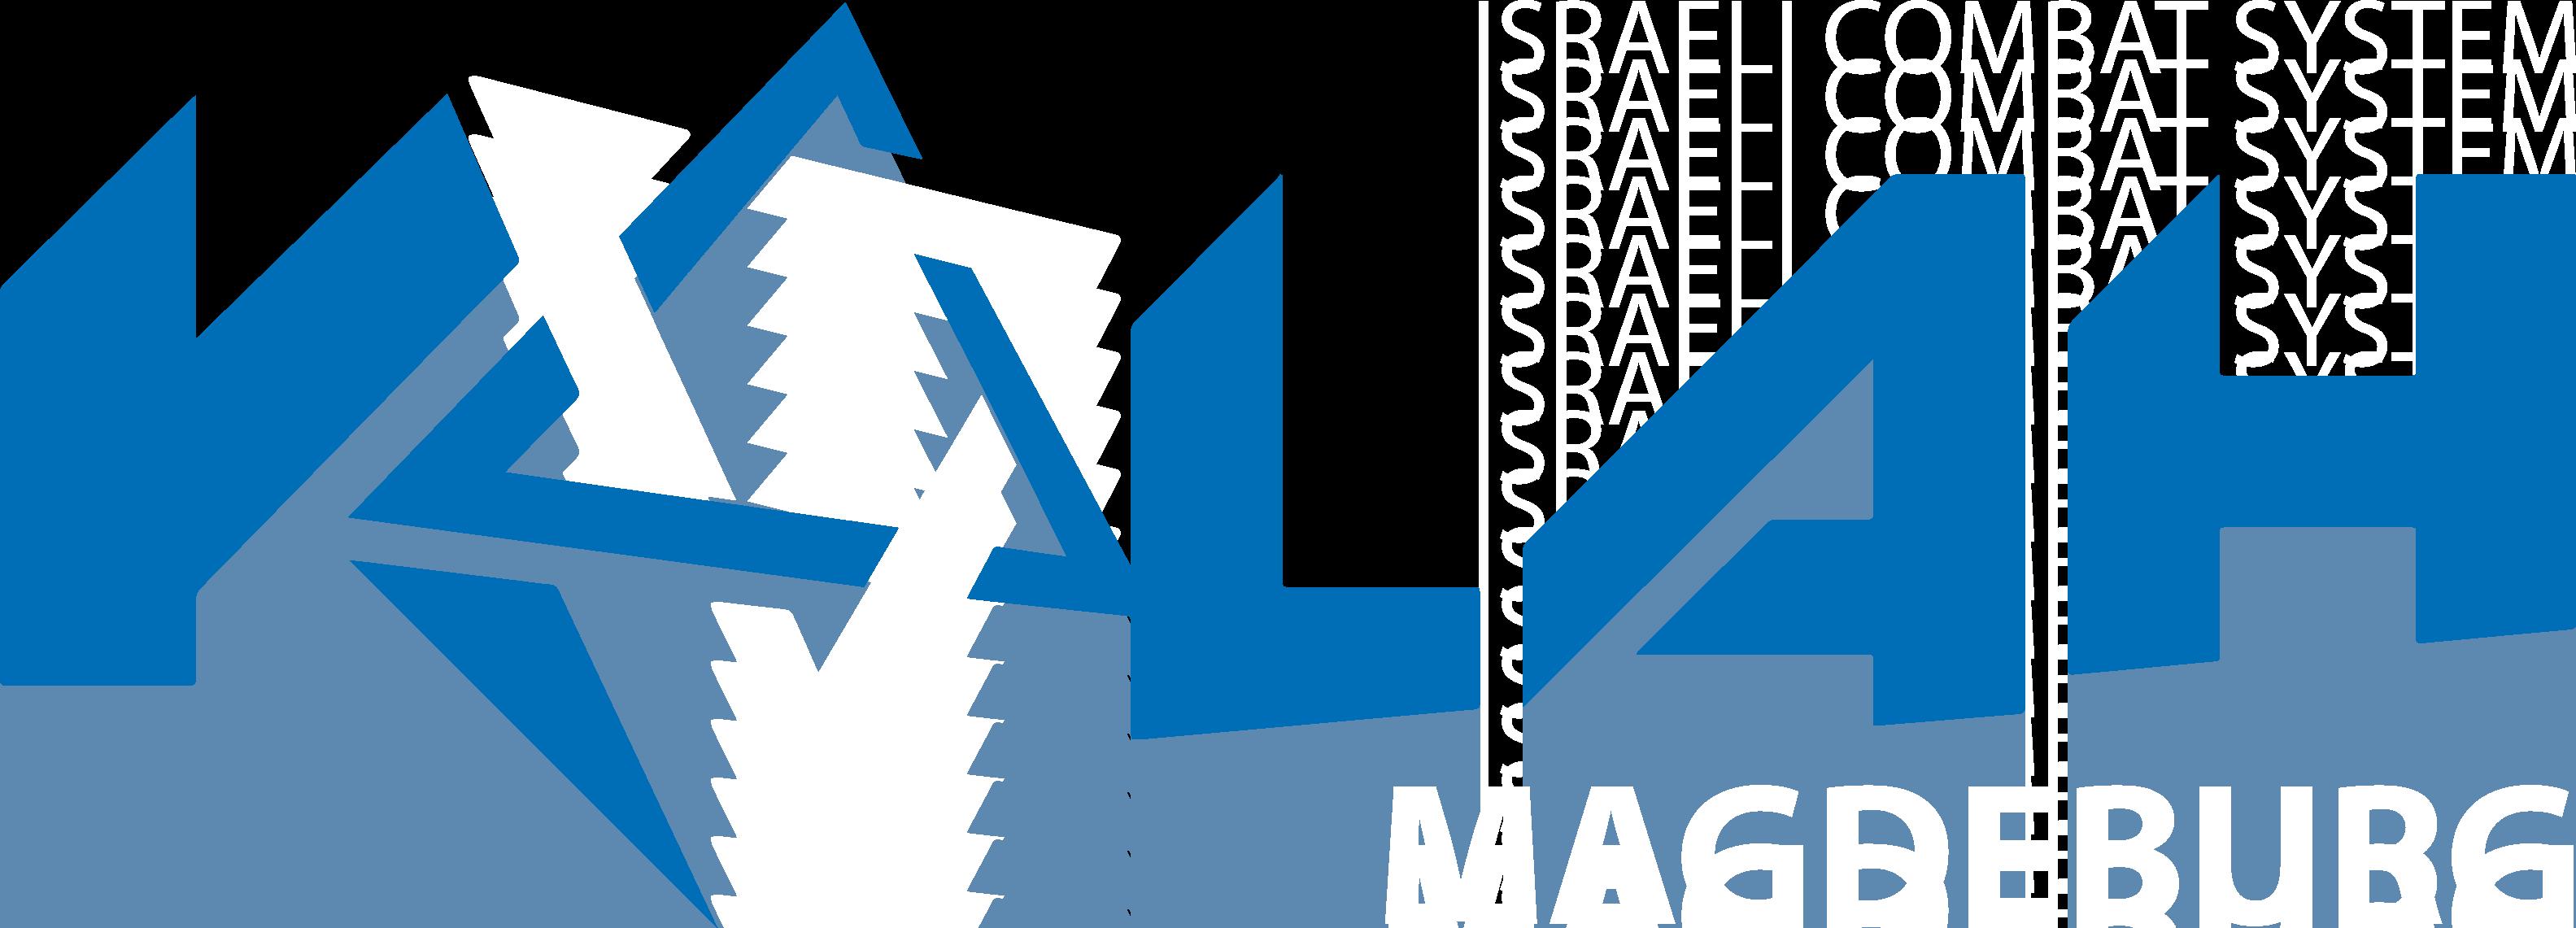 Realistische Selbstverteidigung | Kalah™ Magdeburgess Website